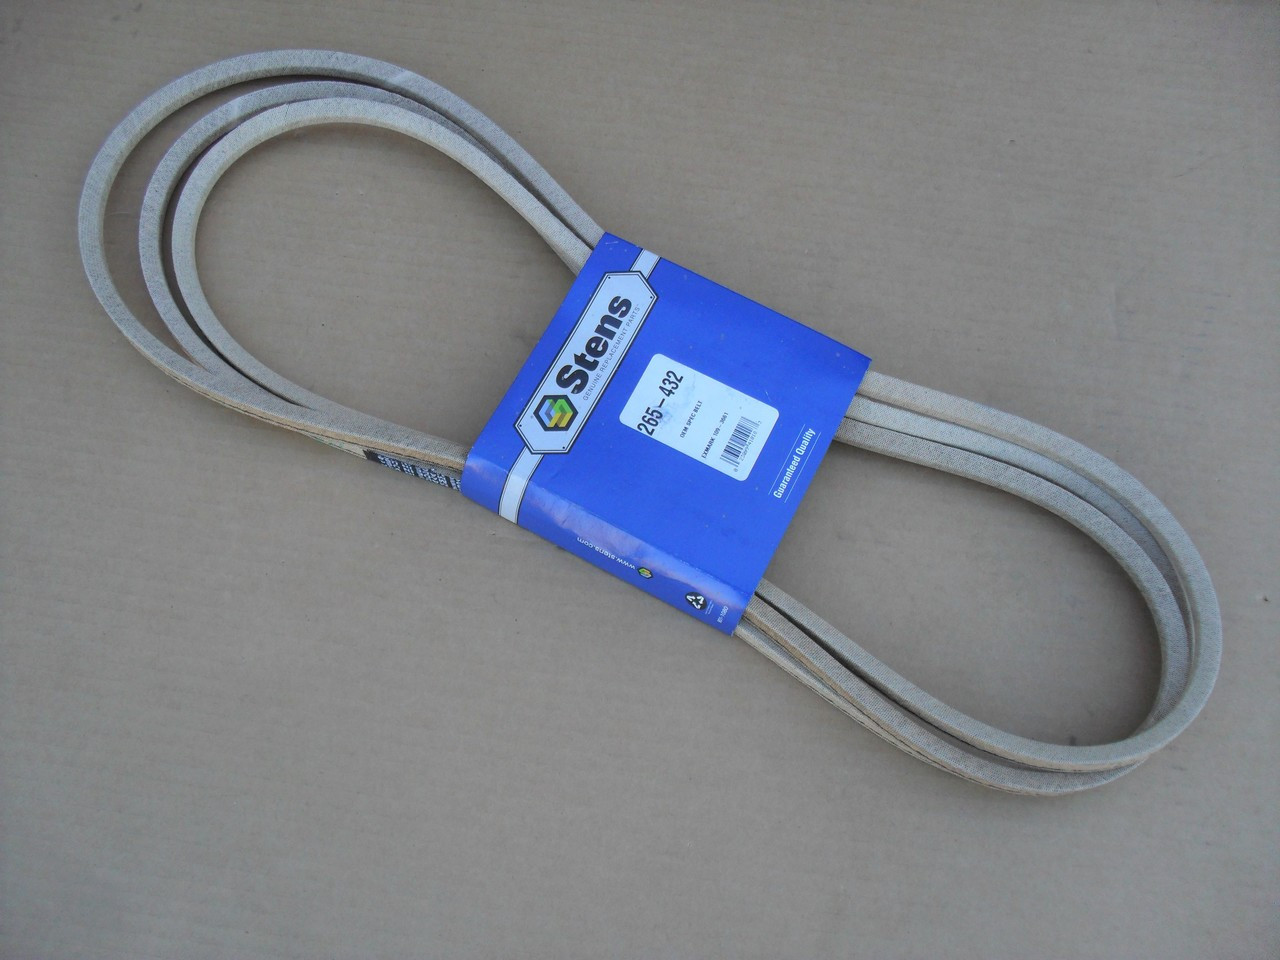 Exmark 109-5364 265-418 Oem Replacement Belt